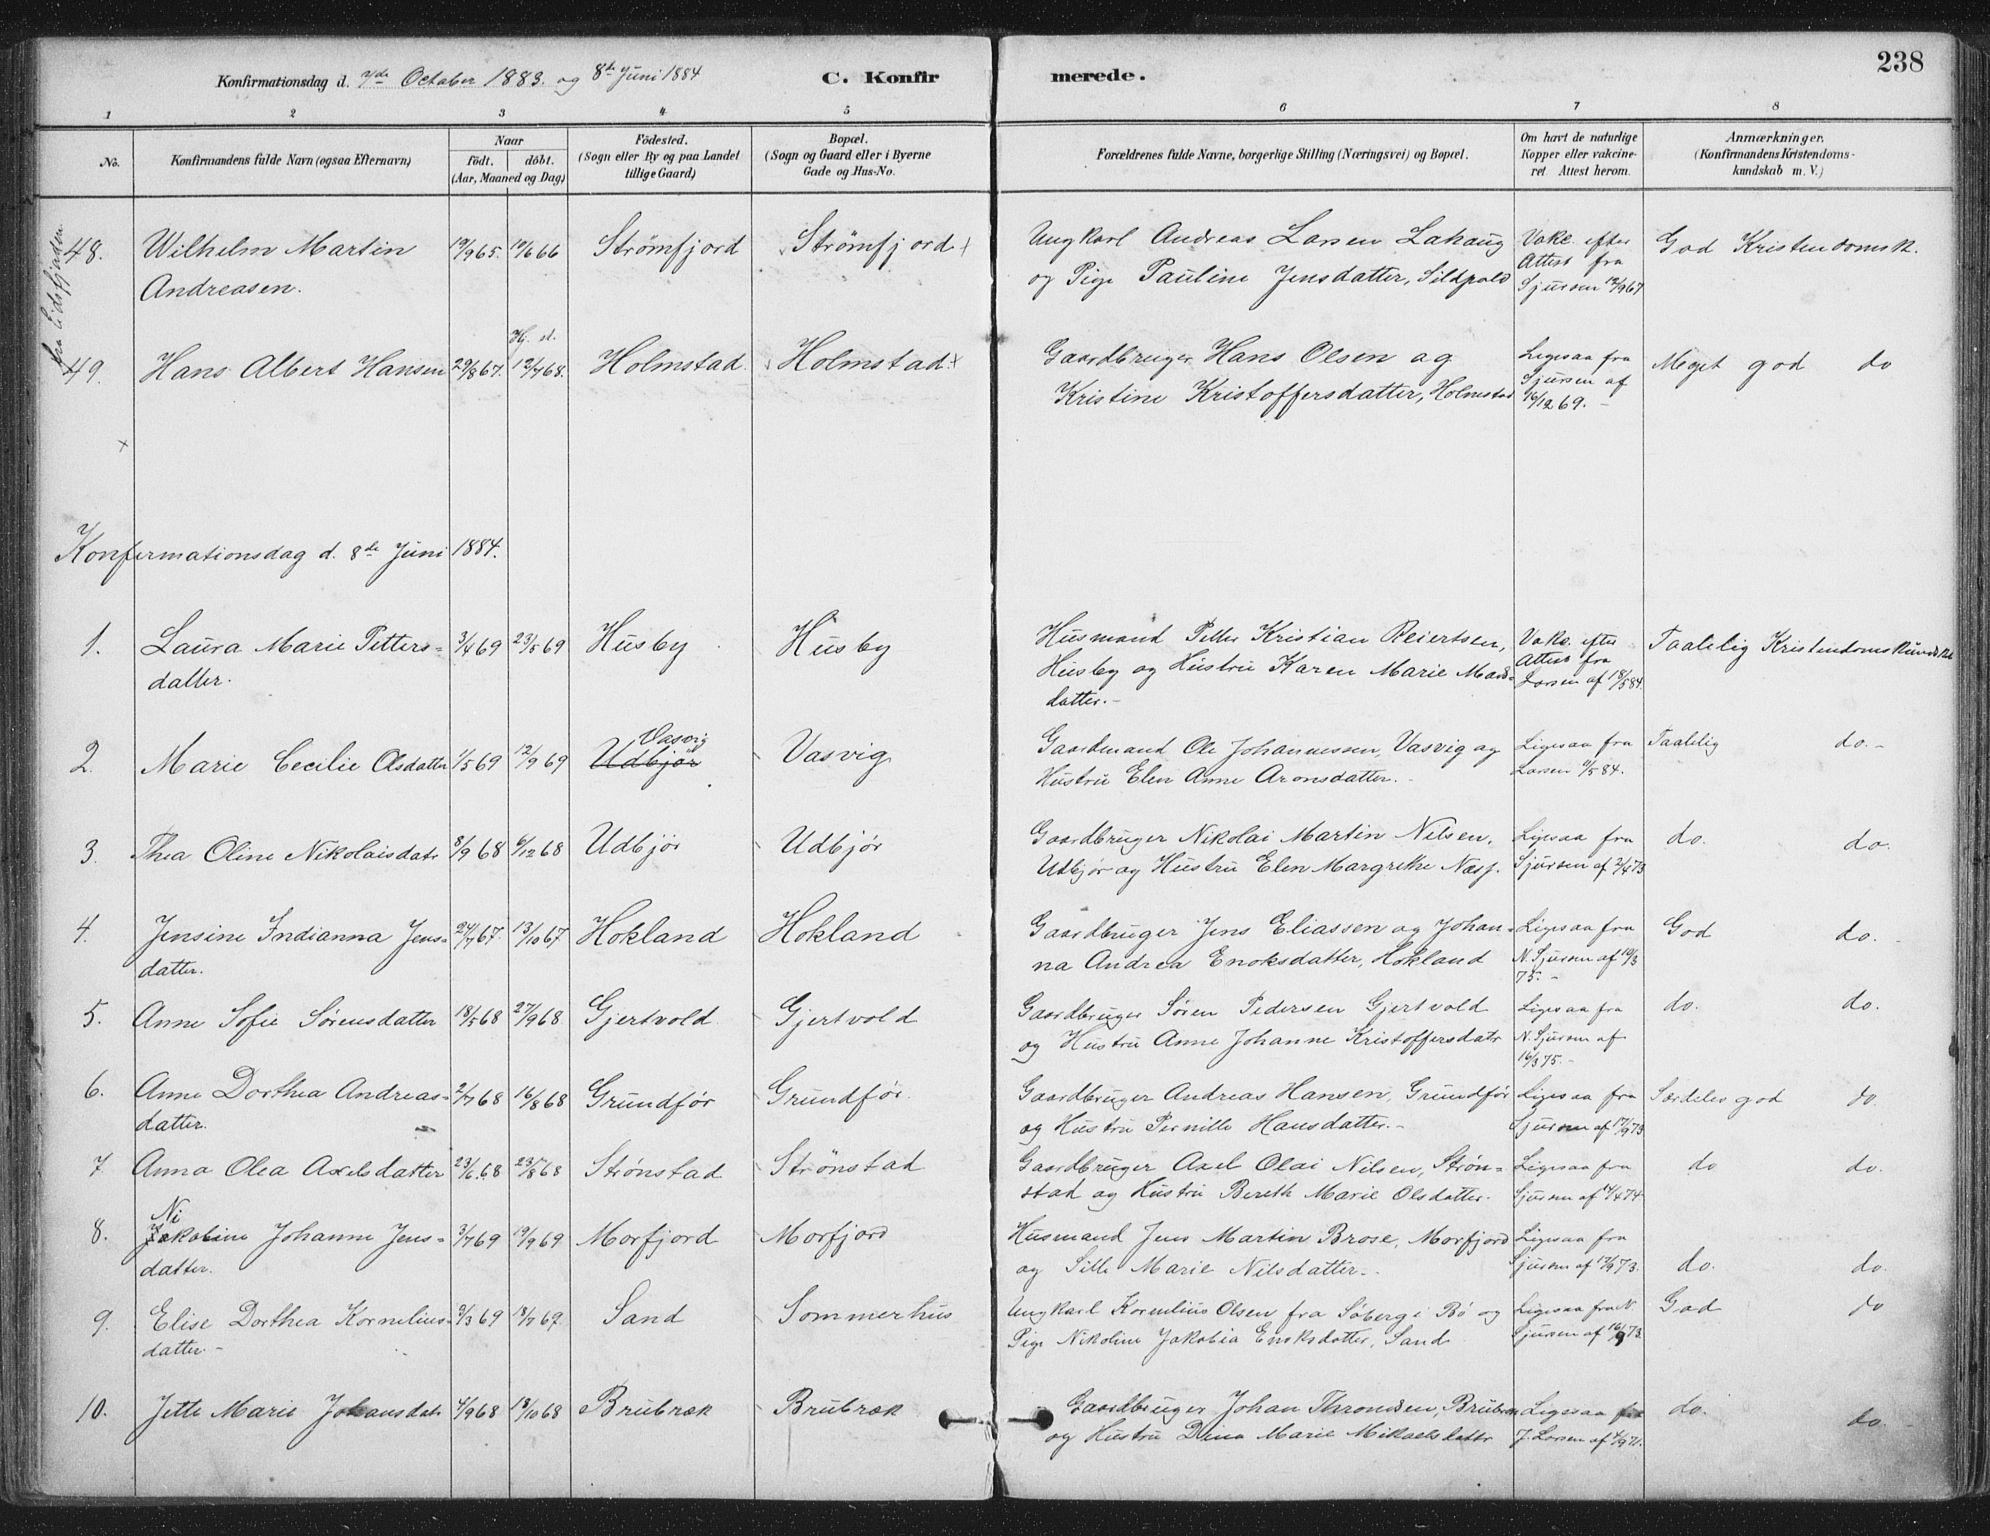 SAT, Ministerialprotokoller, klokkerbøker og fødselsregistre - Nordland, 888/L1244: Ministerialbok nr. 888A10, 1880-1890, s. 238